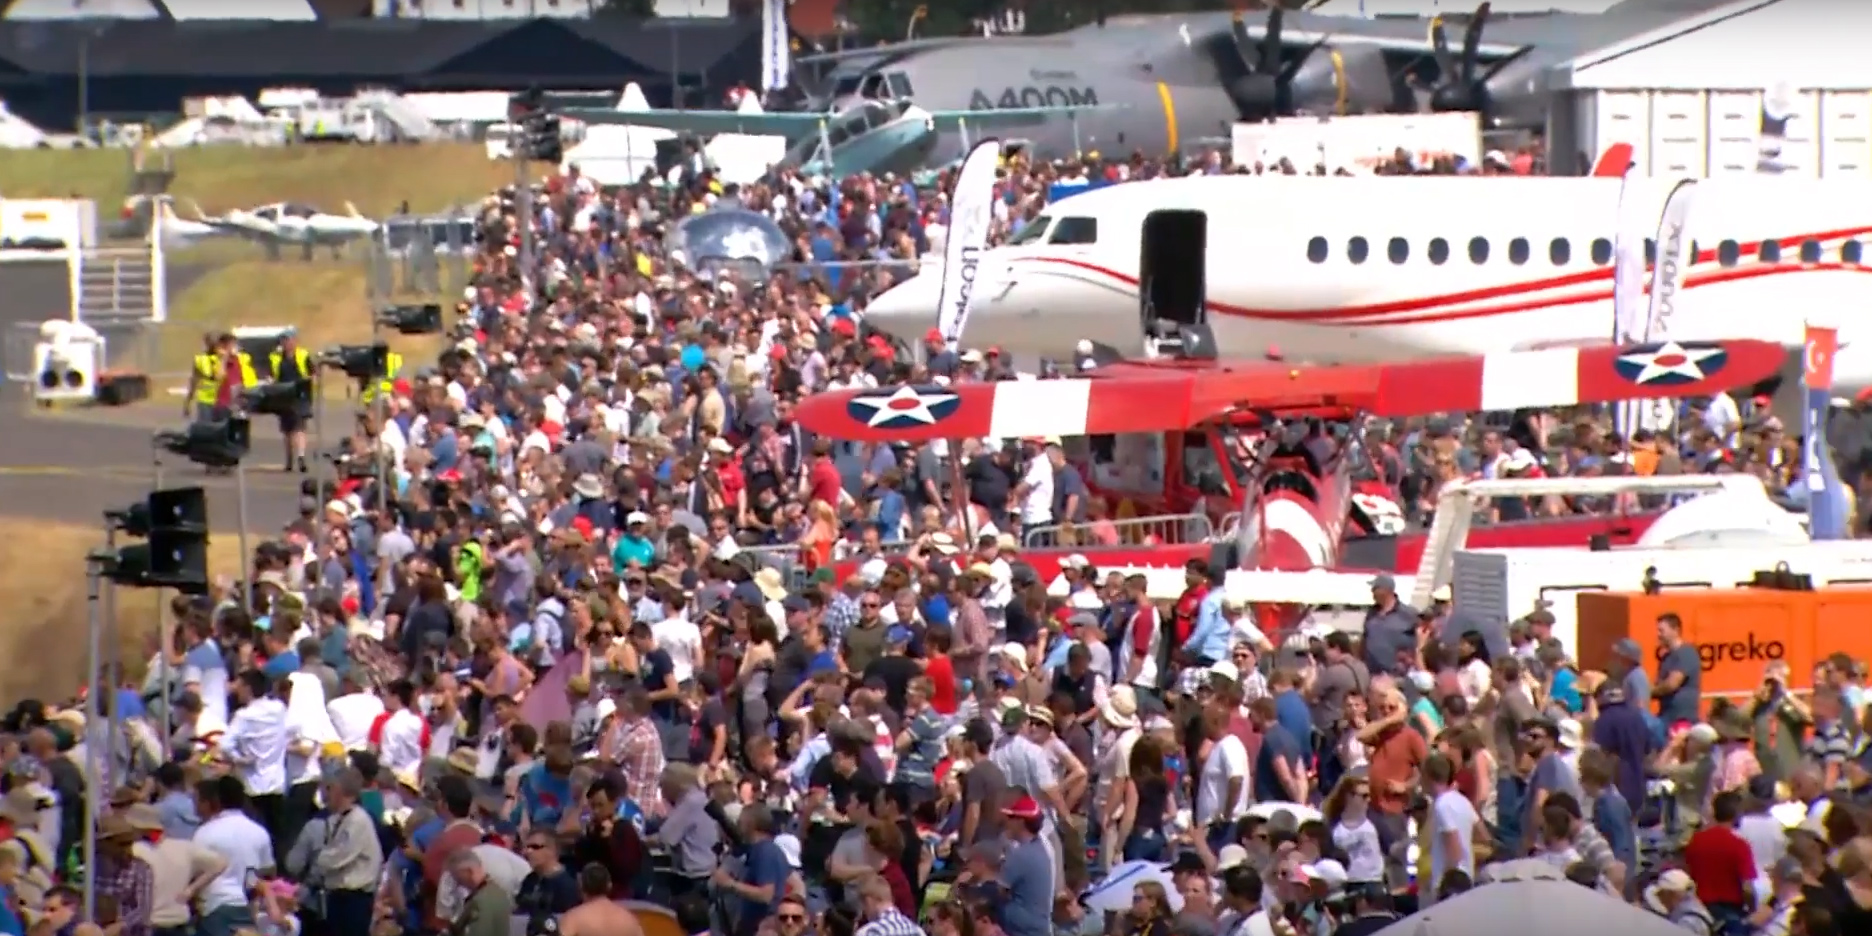 SafeSmart Brings MRO Safety to Farnborough Airshow